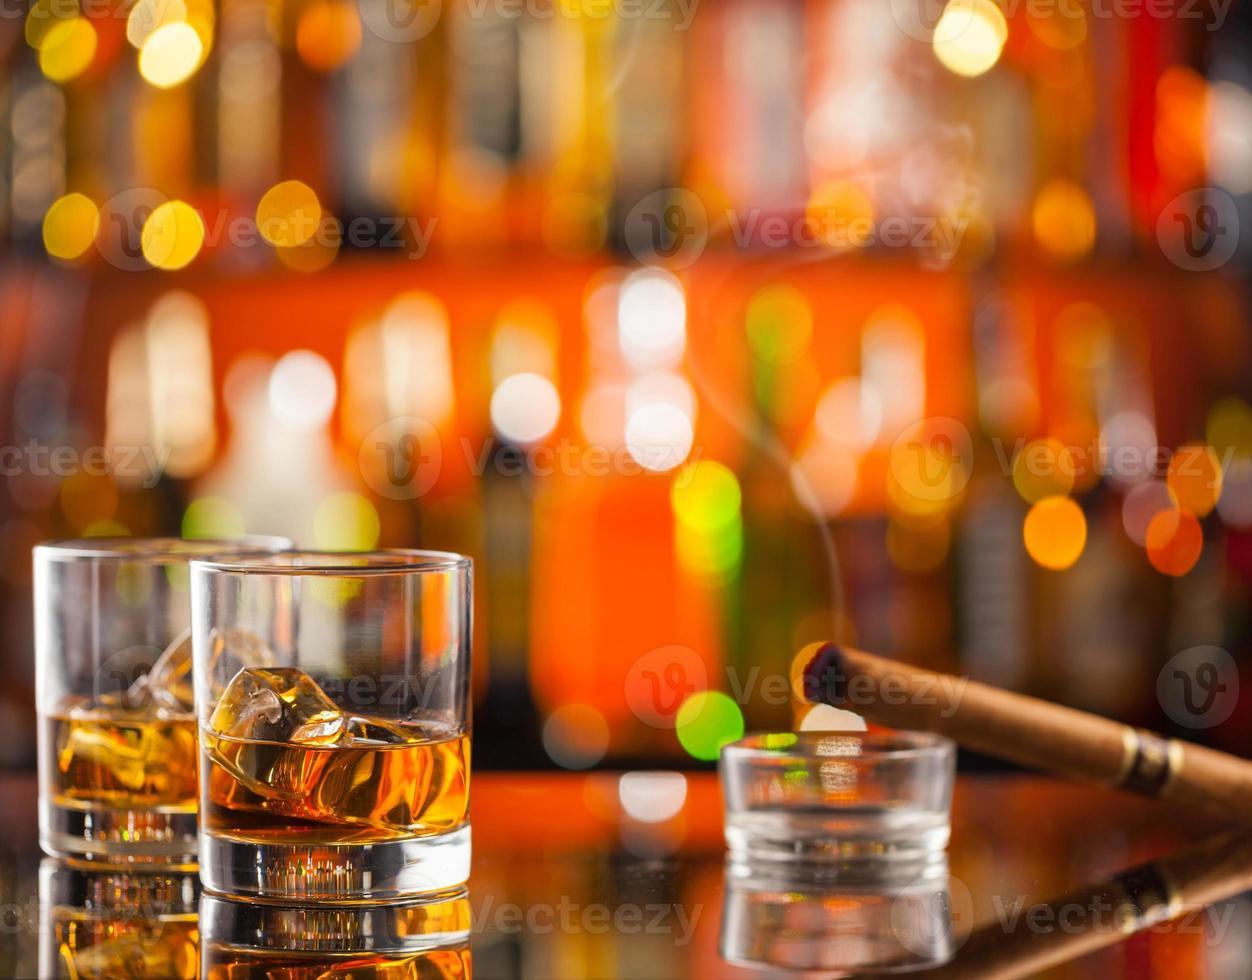 Whiskygetränke an der Theke foto